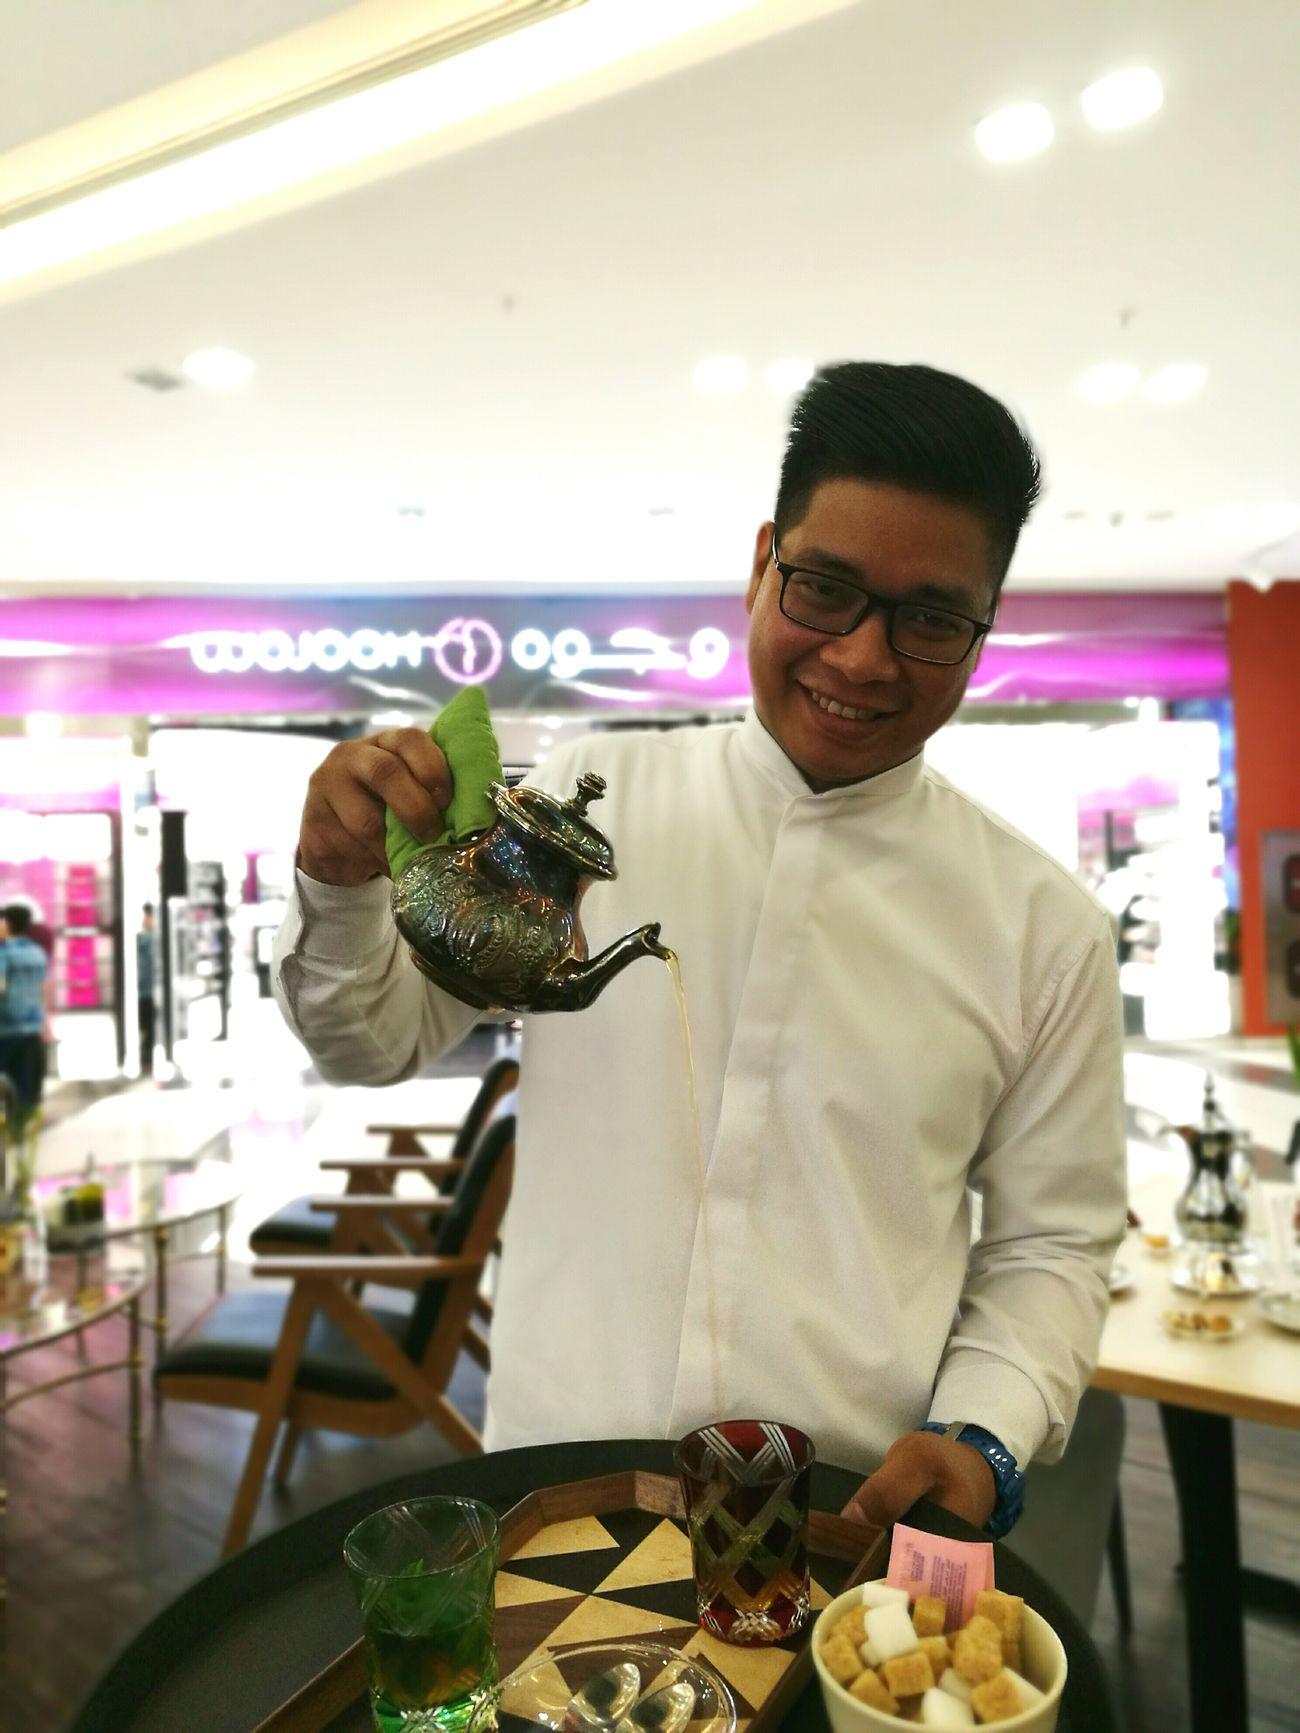 Green Tea time . Kuwait city Kuwait City Yousf Ali Huawei P9 Leica Huaweiphotography Green Tea Sultan Mall